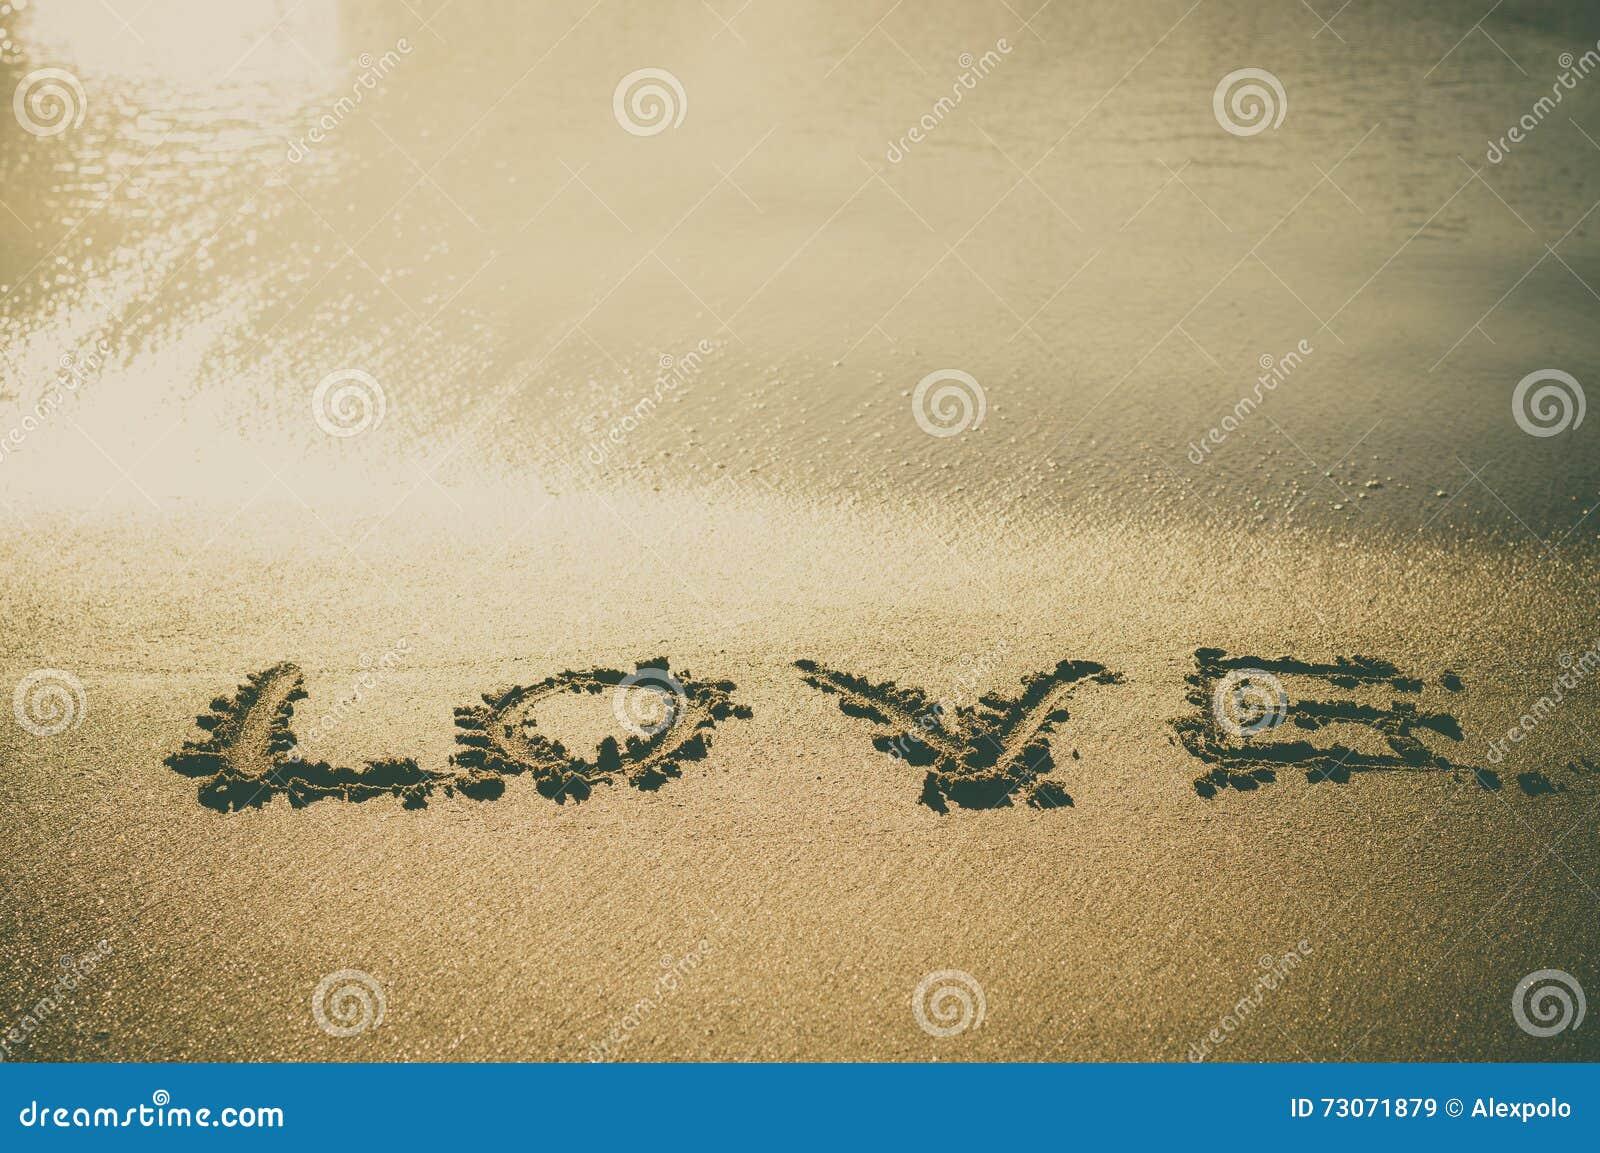 Love wate is God Is